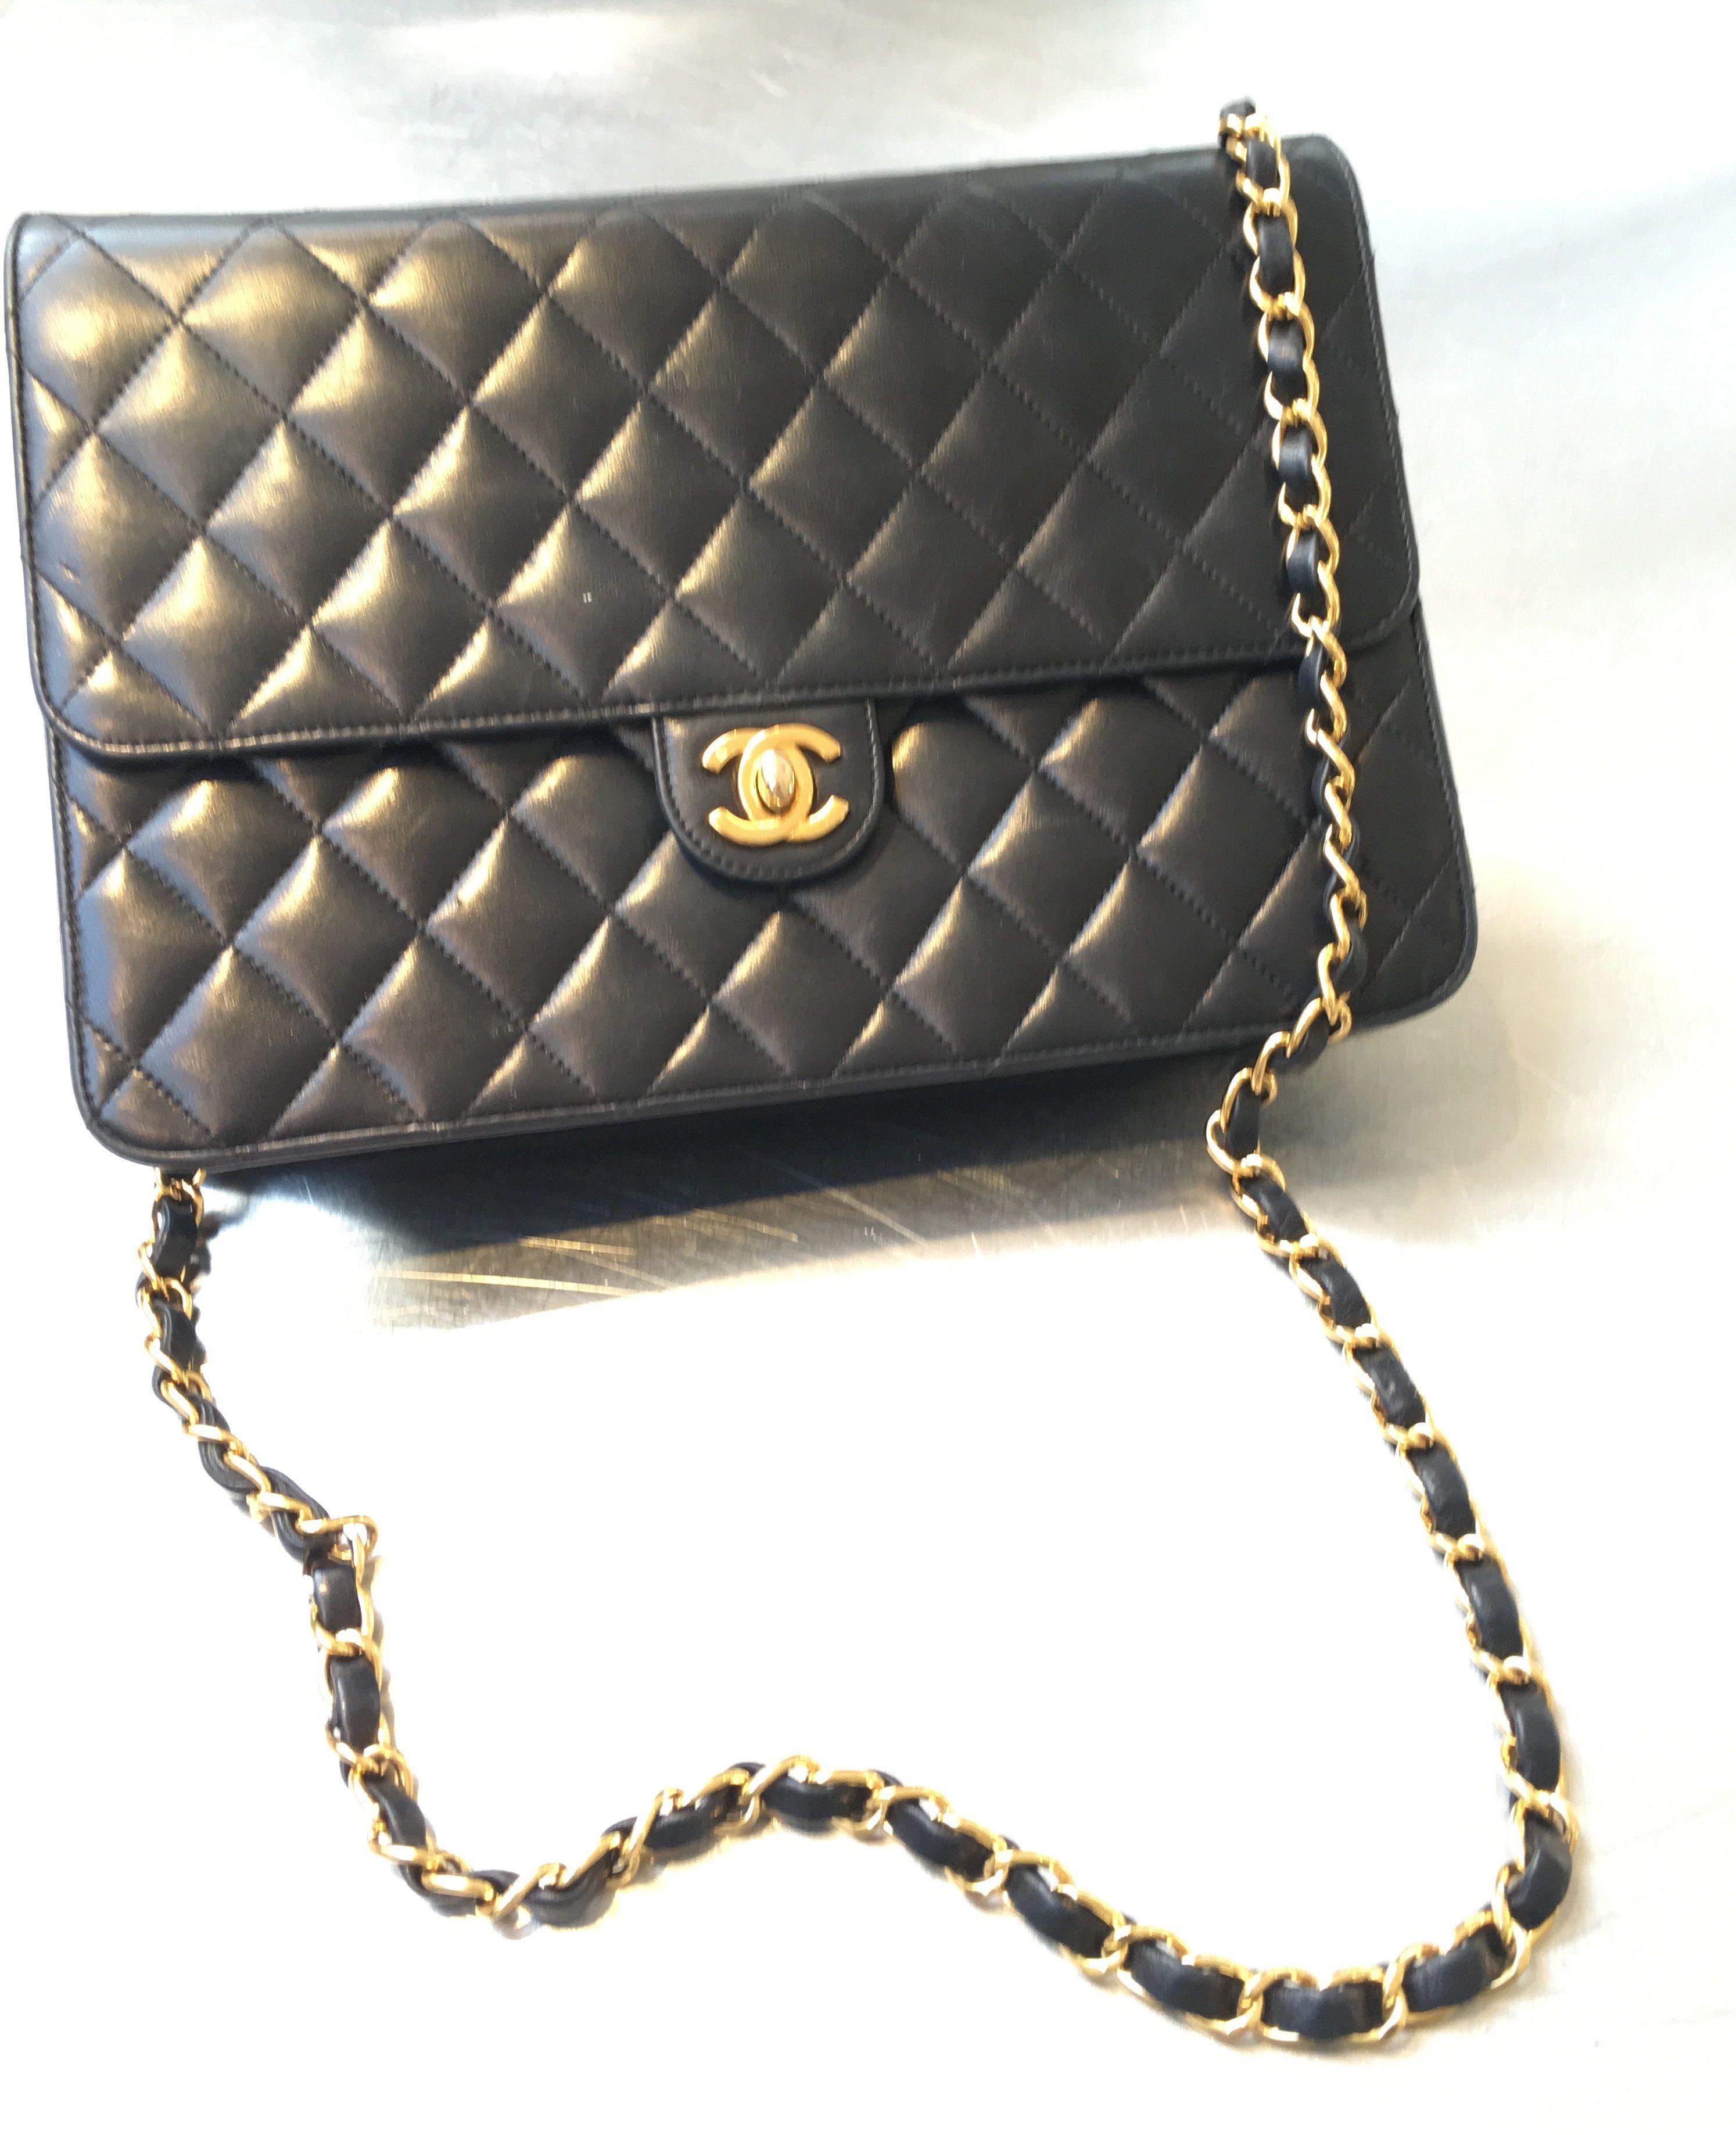 #Chanel #classic #black #lambsleather #foodfashionandtravel #handbags #fashion #foodblog #foodblogger #wheretoeatinLondon #Londonrestaurantblog #LondonFoodie #whatIwore www.fizzoflife.com